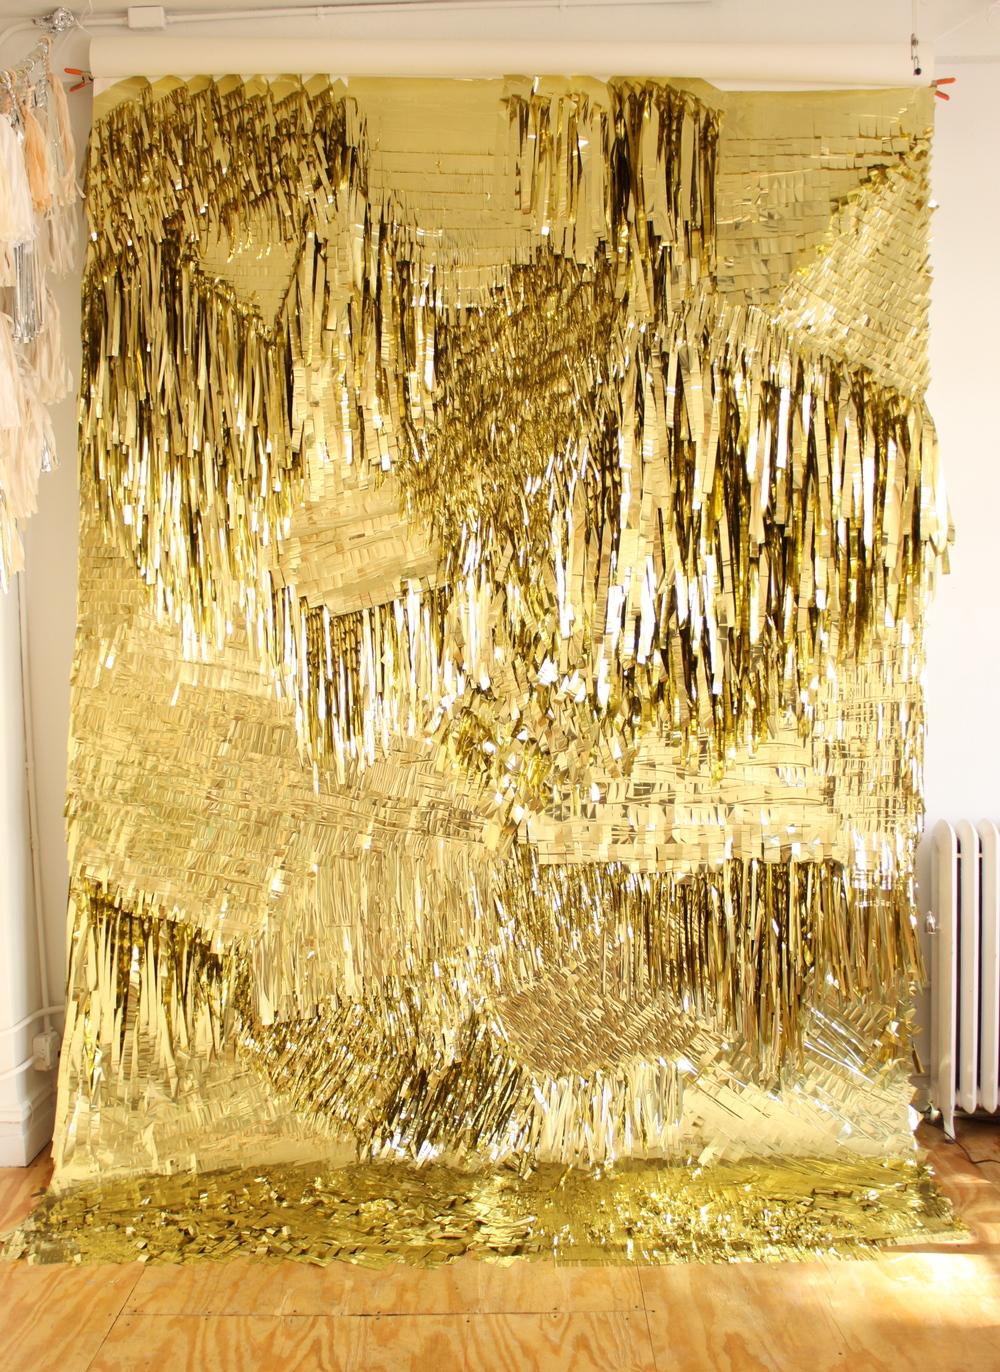 Gold Wall, 2010CONFETTISYSTEM,Metallic foil, canvas Photo: CONFETTISYSTEM